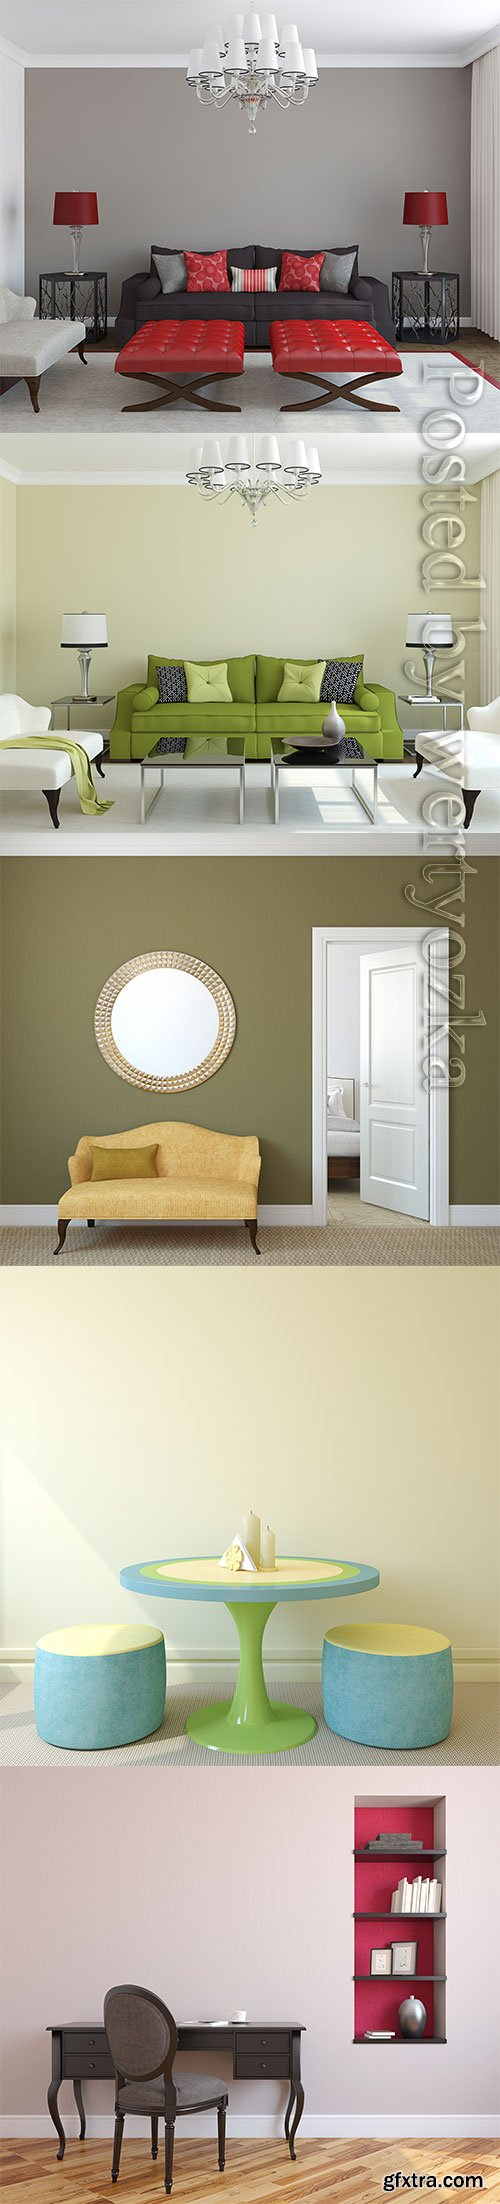 Hallway interior, sofas and armchairs stock photo